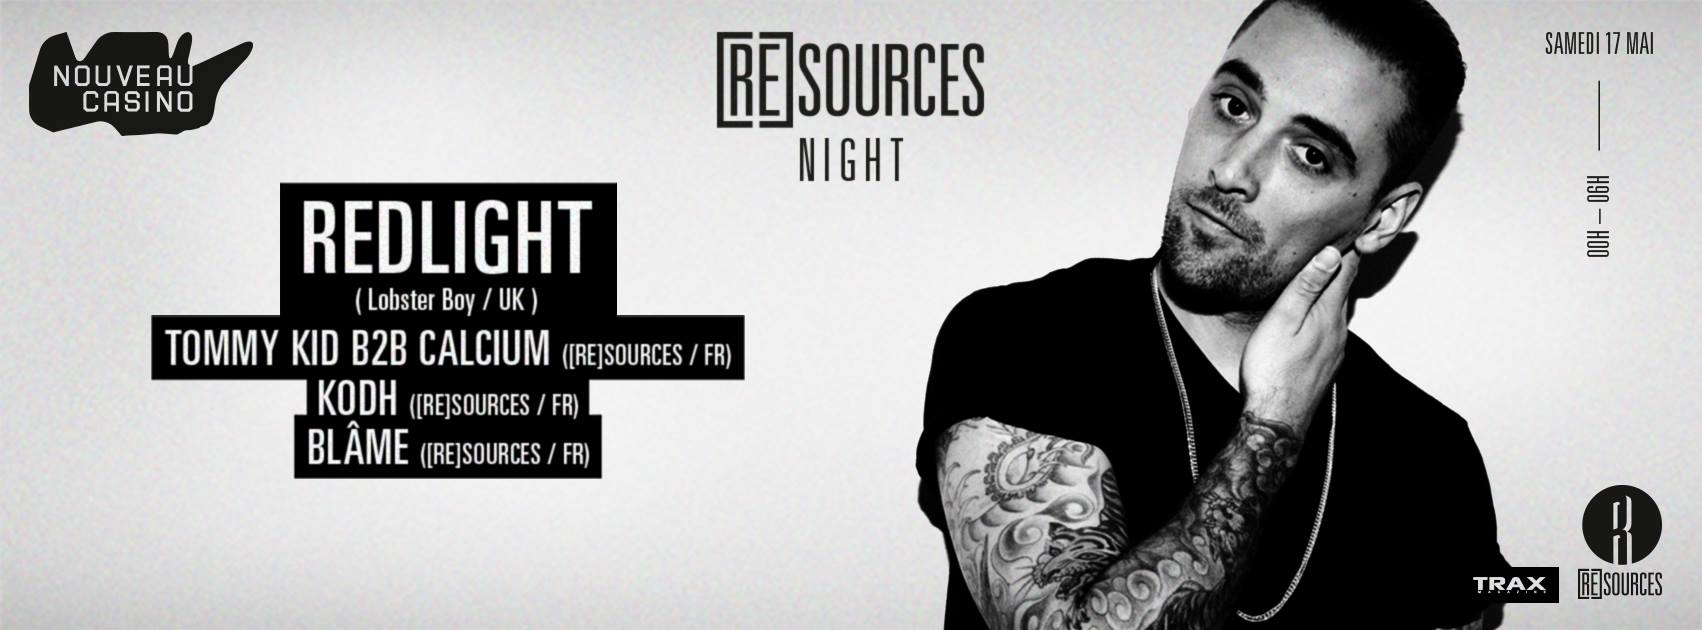 Redlight - Tommy Kid B2B Calcium Kodh Resources Night